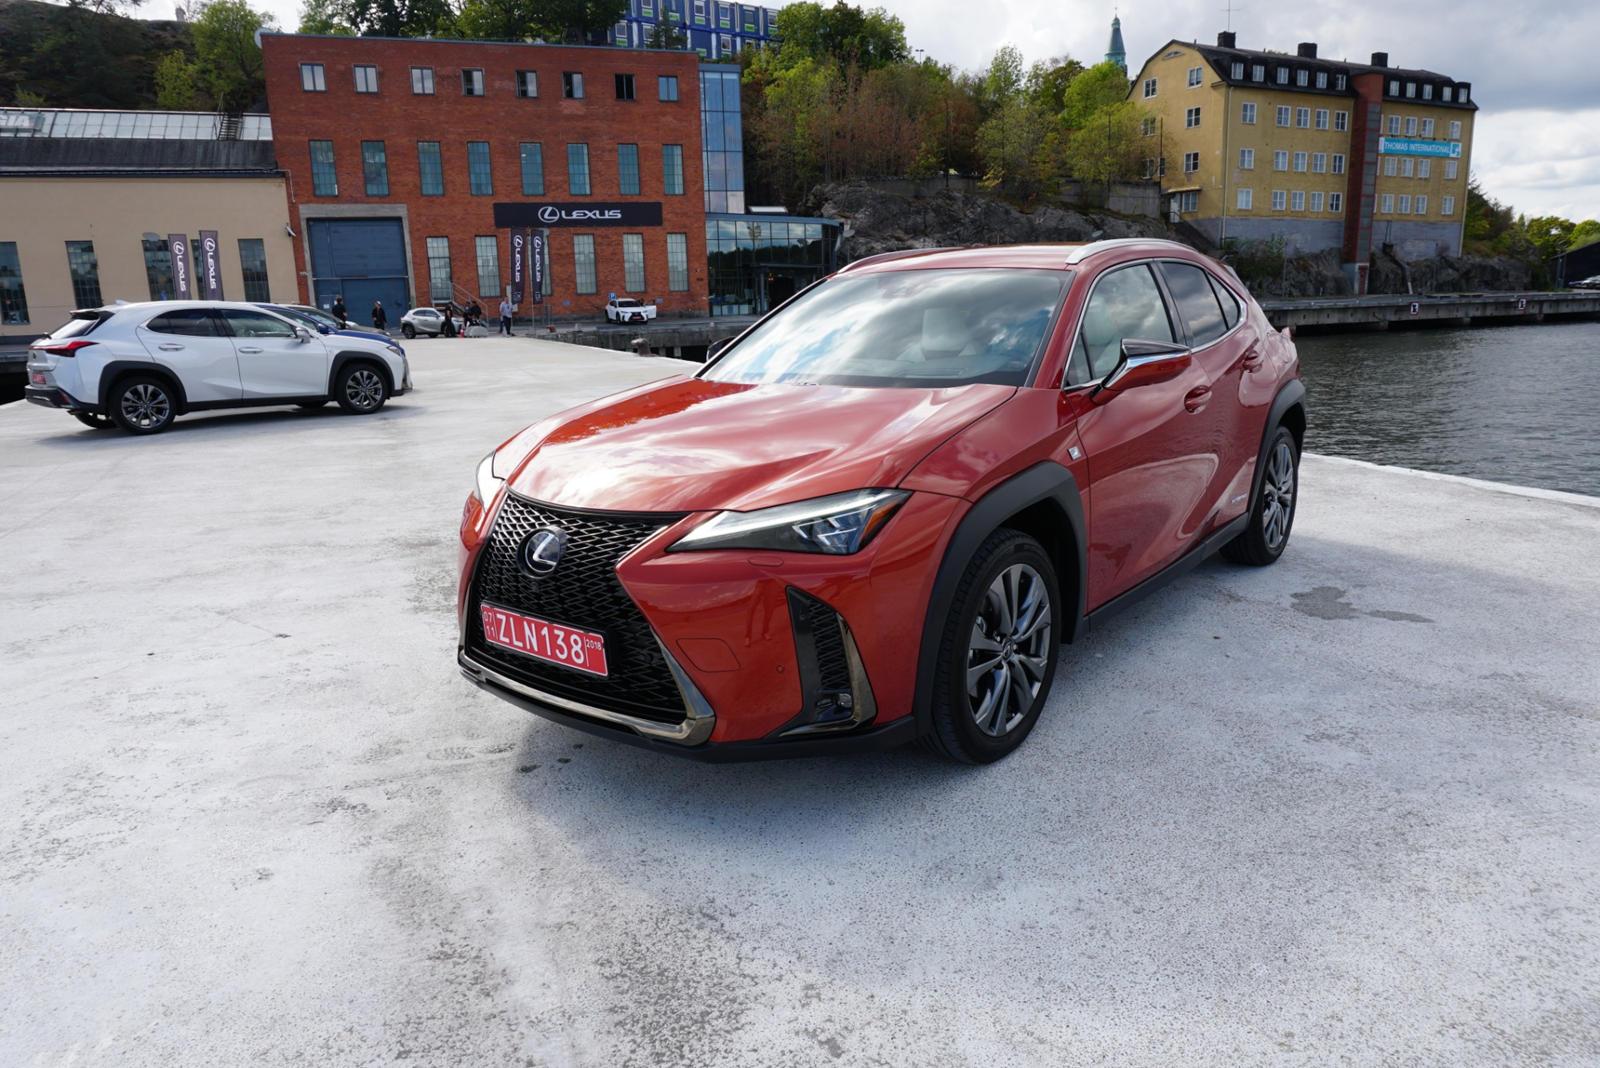 1344 2019 Lexus UX First Drive Review: The Urban Explorer